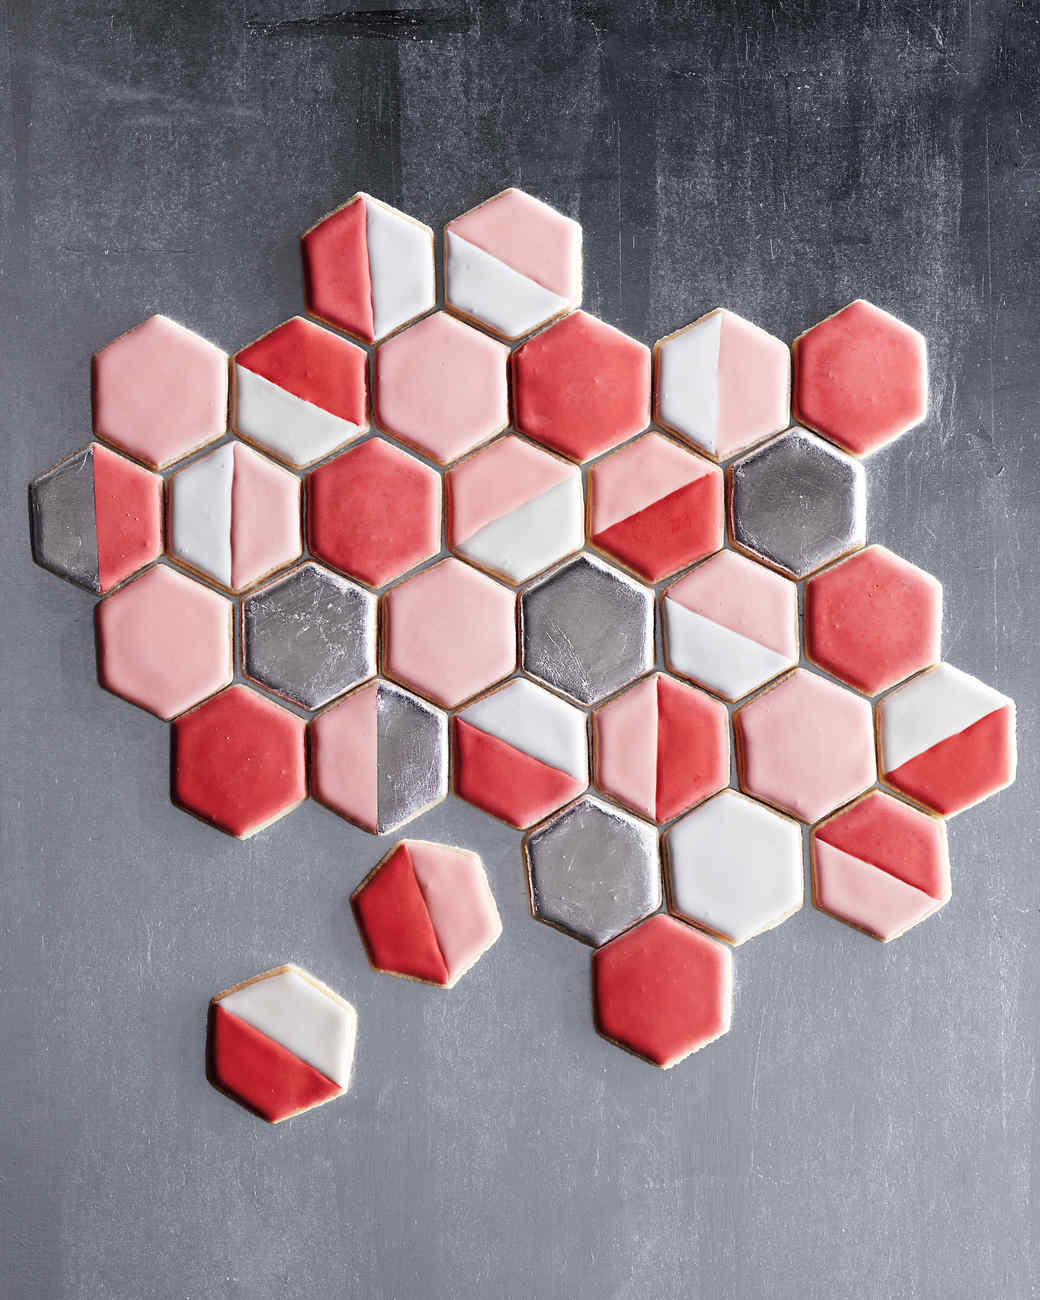 silver-hexagon-cookies-0381-d112411.jpg